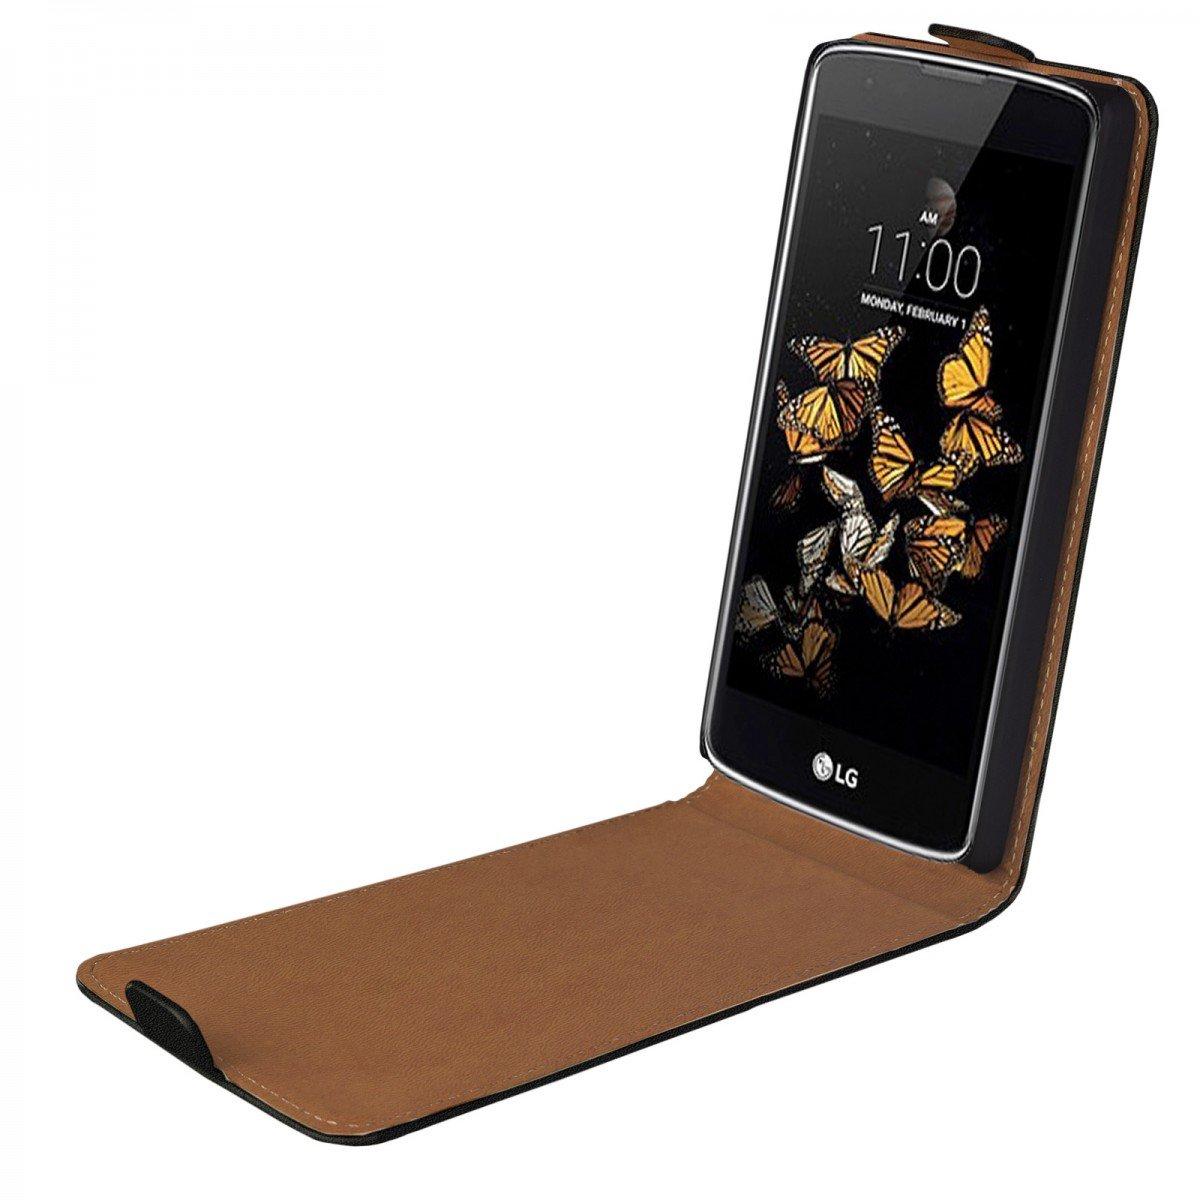 eFabrik Flip Case für LG K8 Hülle Tasche: Amazon.de: Elektronik